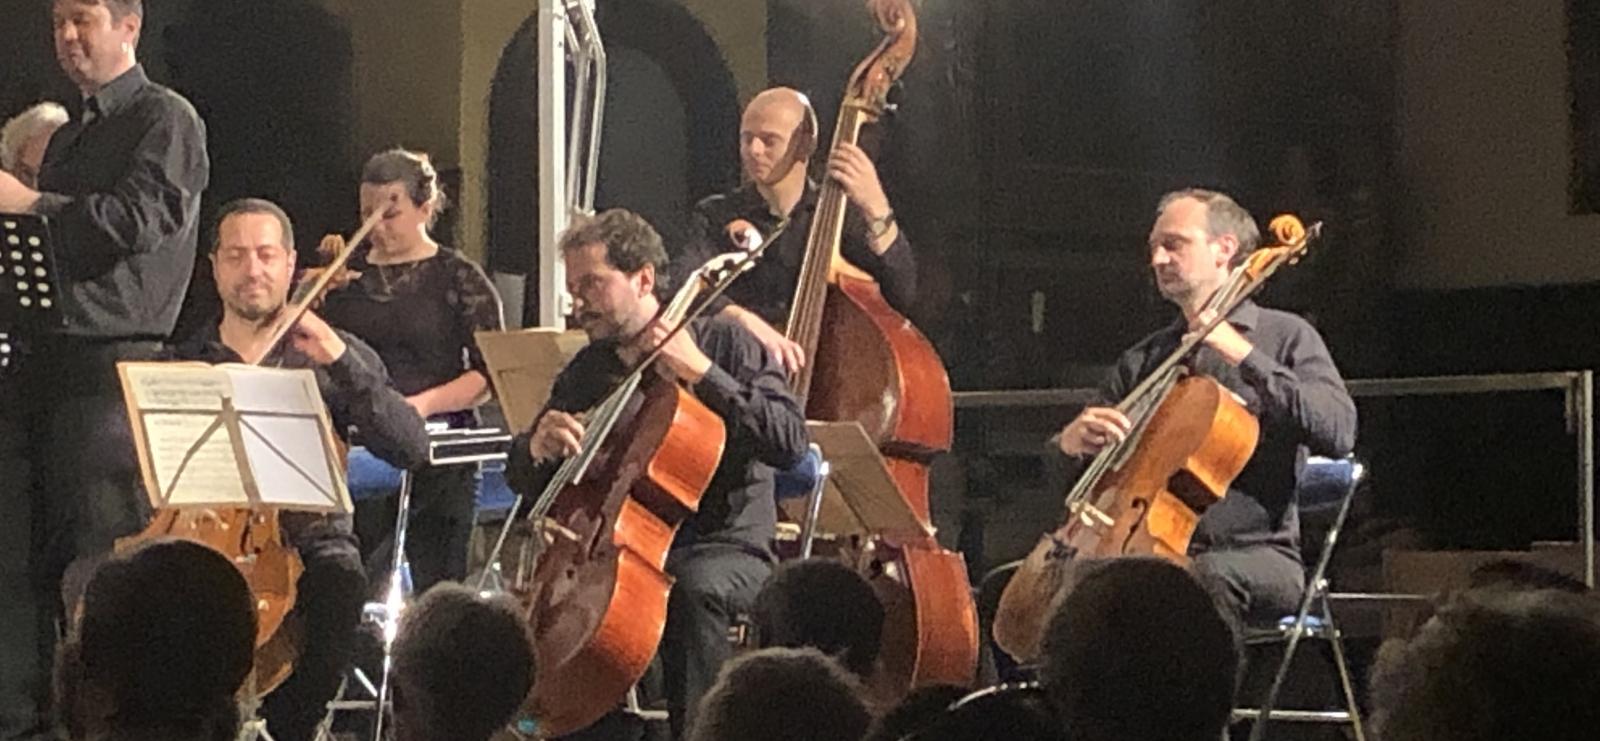 festival Cellofan